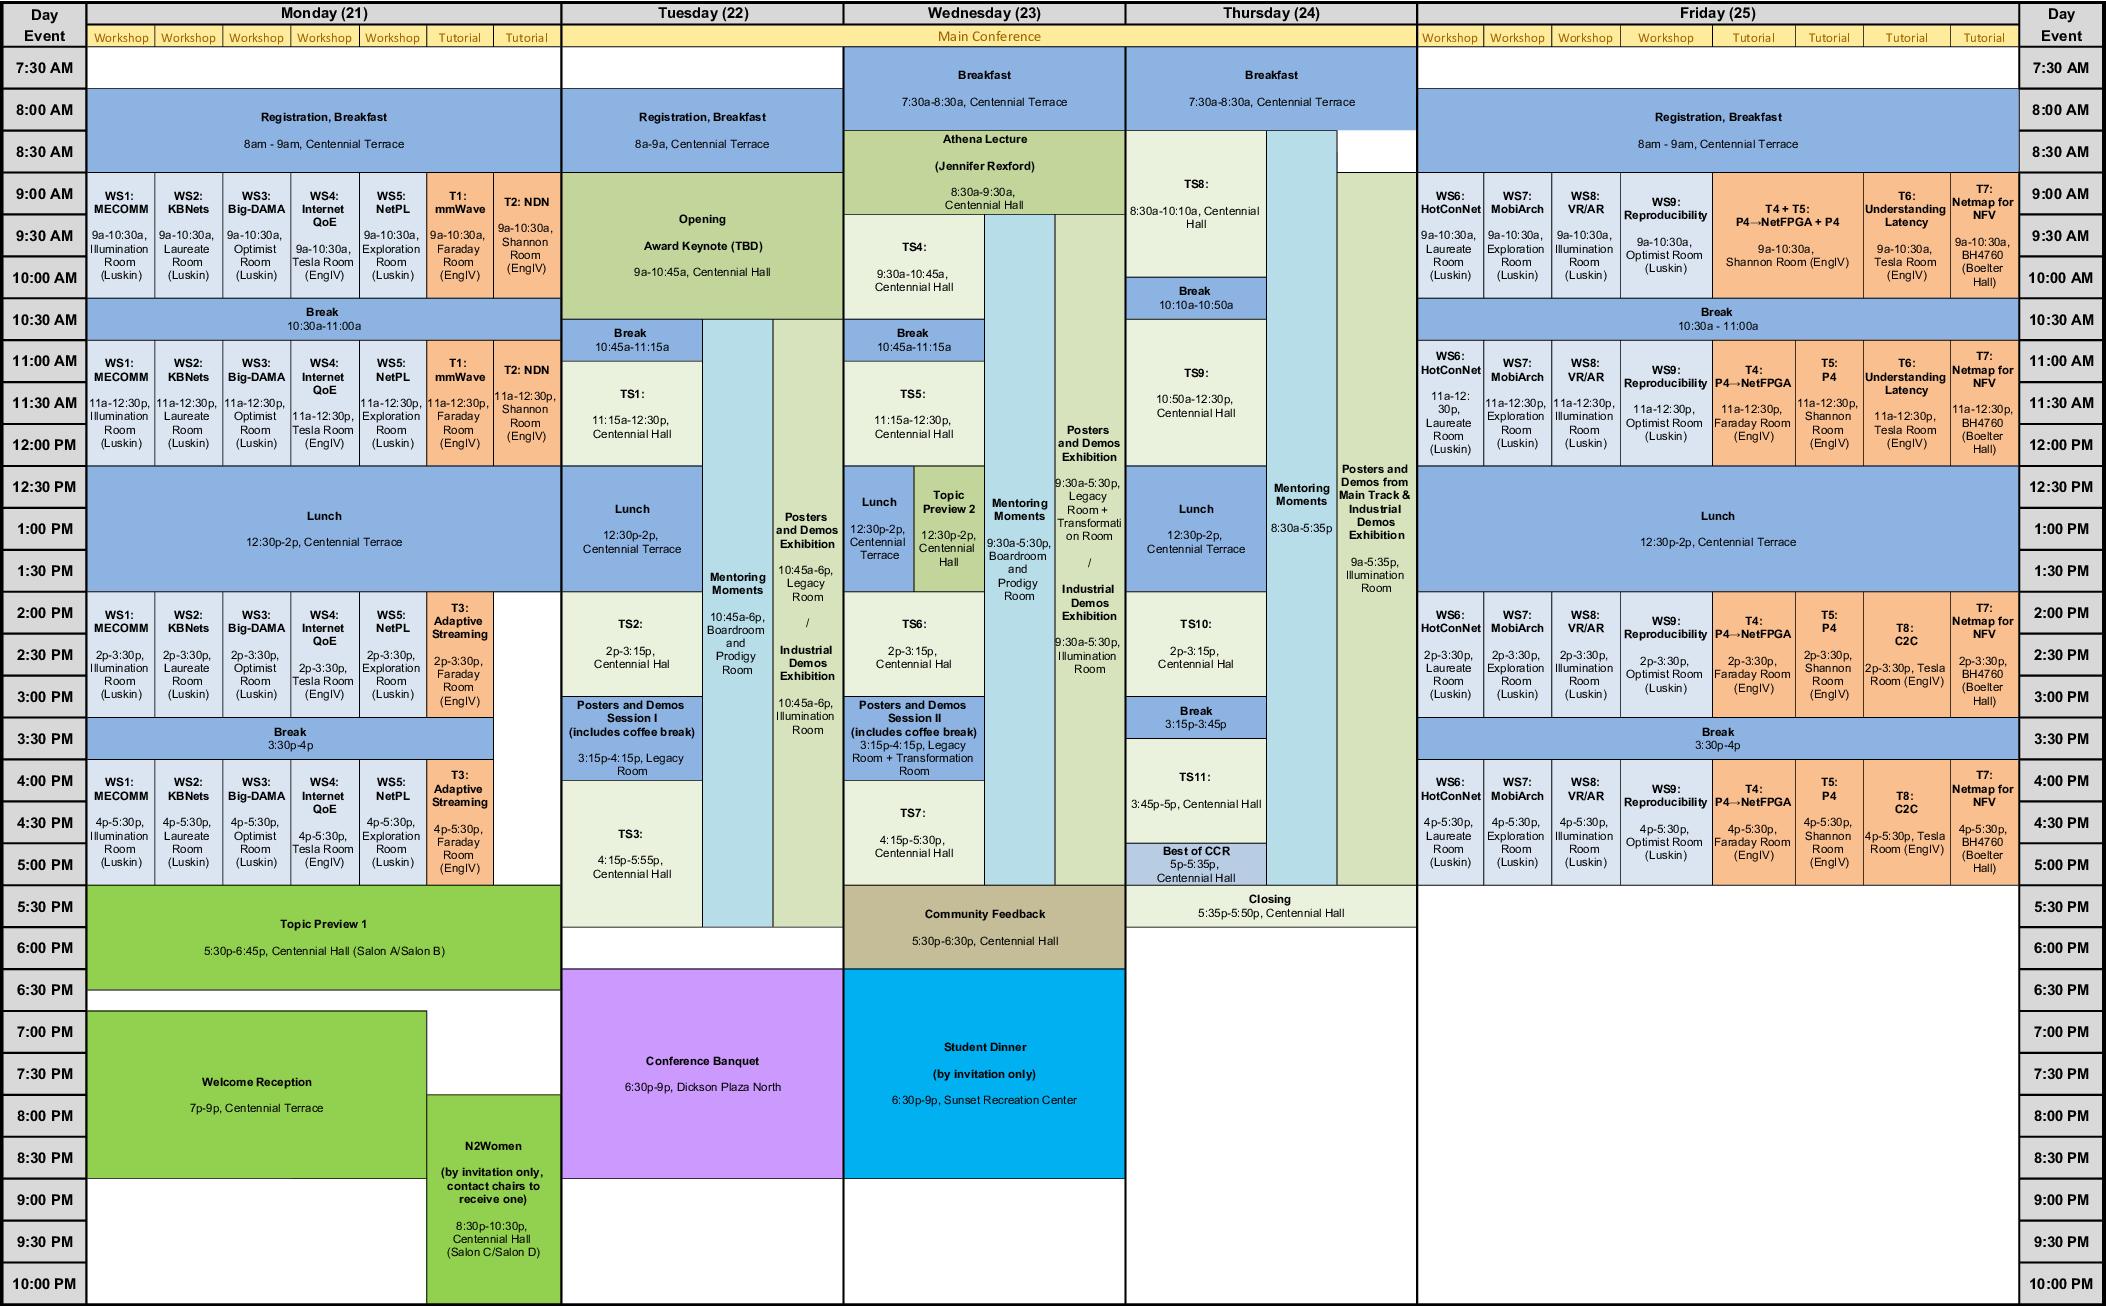 Conference Program - ACM SIGCOMM 2017